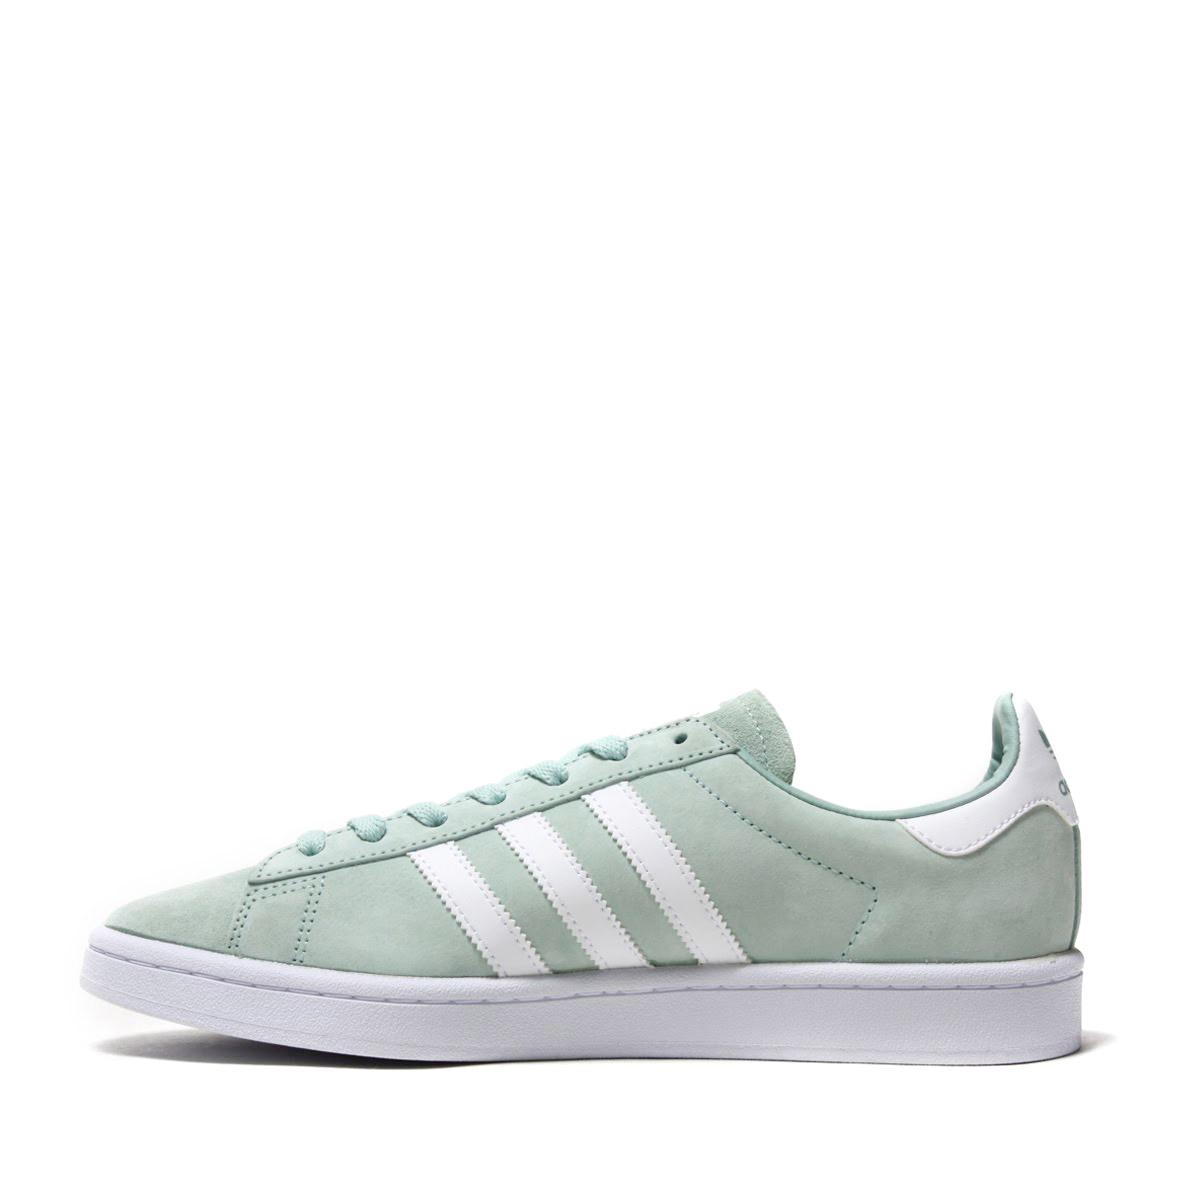 reputable site 7f225 8b248 adidas Originals CAMPUS (Adidas original scan pass) Ash GreenRunning  WhiteRunning White 18SS-I